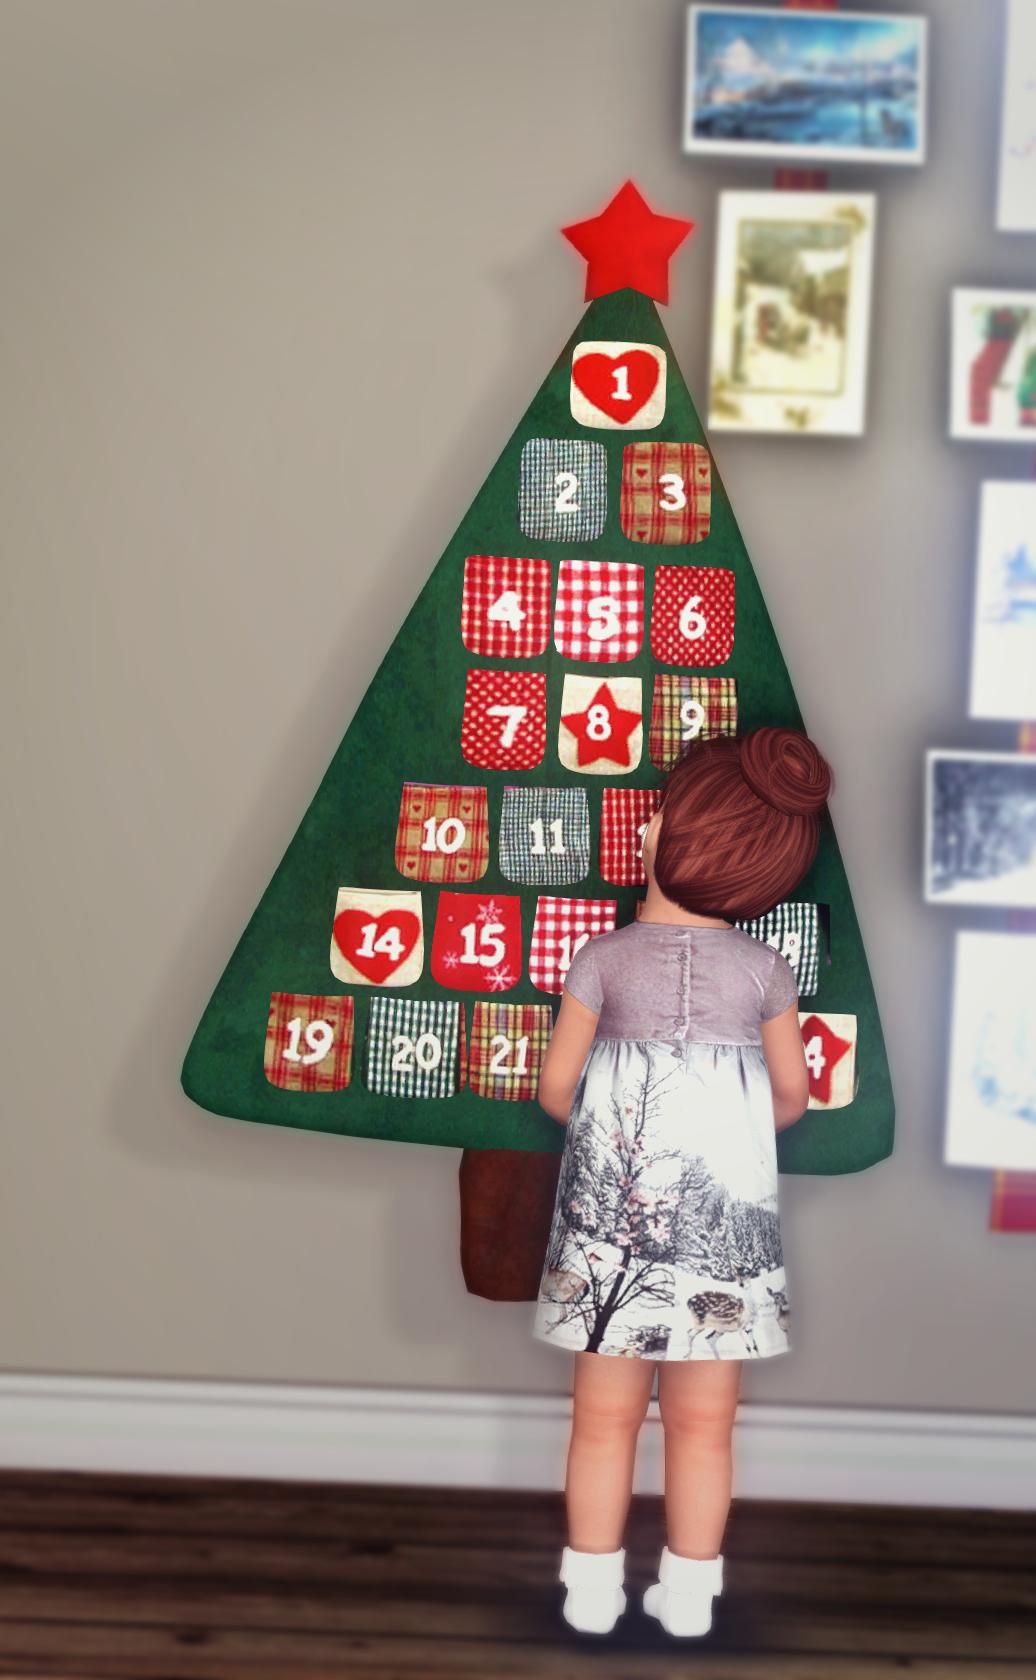 Tu Tu Cute The Sims 3 Cc Paintingsposterswall Decor Pinterest